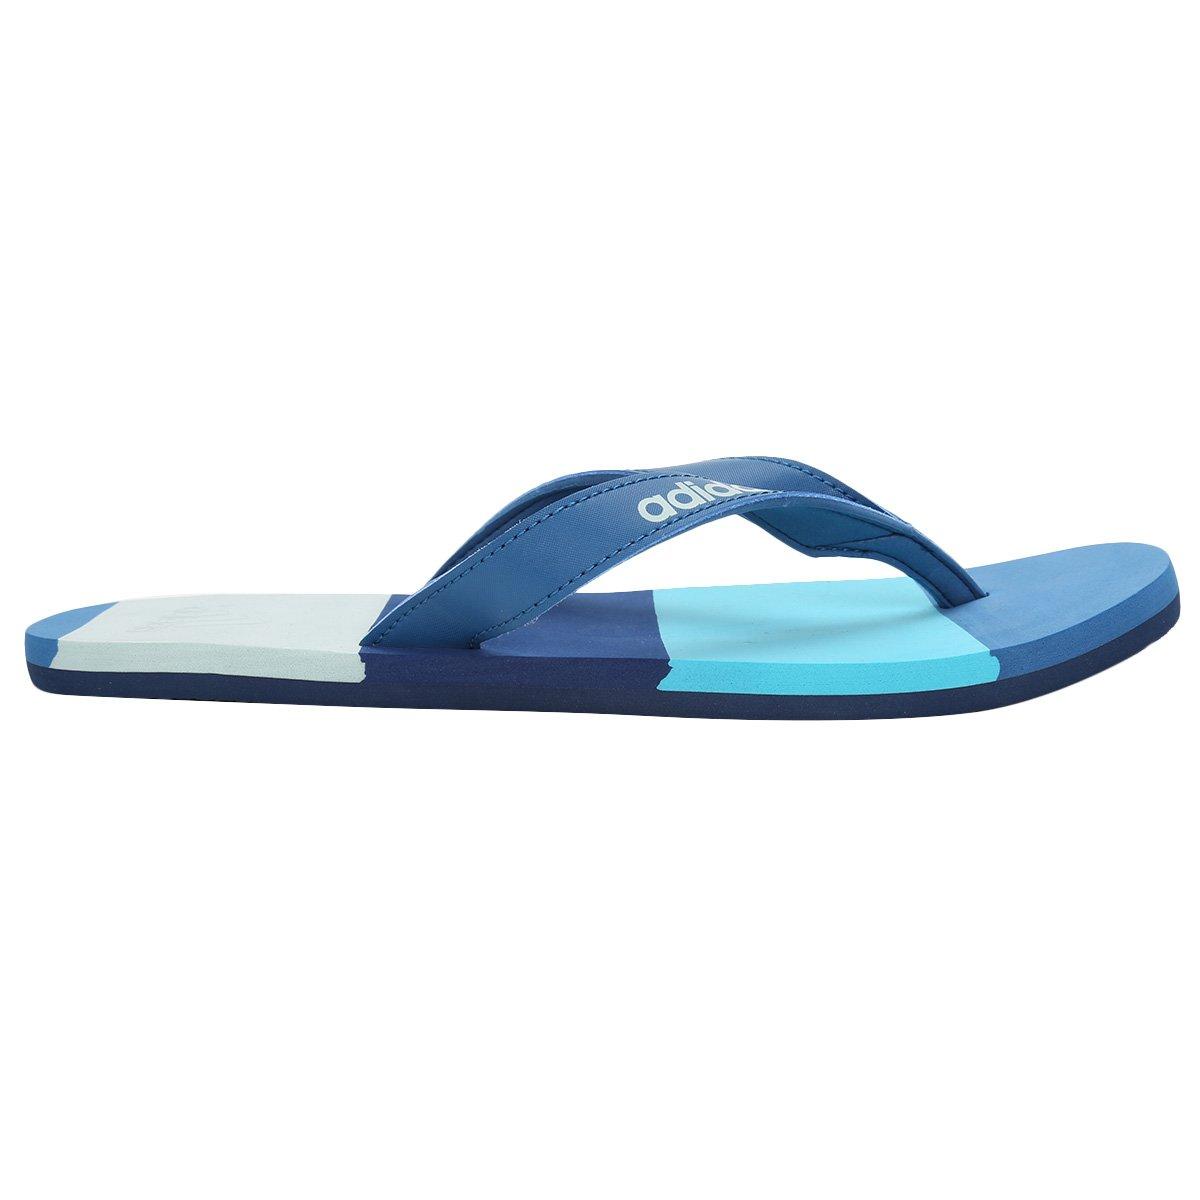 Adidas Chinelo Chinelo Adidas Striped Azul Eezay Azul Eezay Striped ngnqUvp